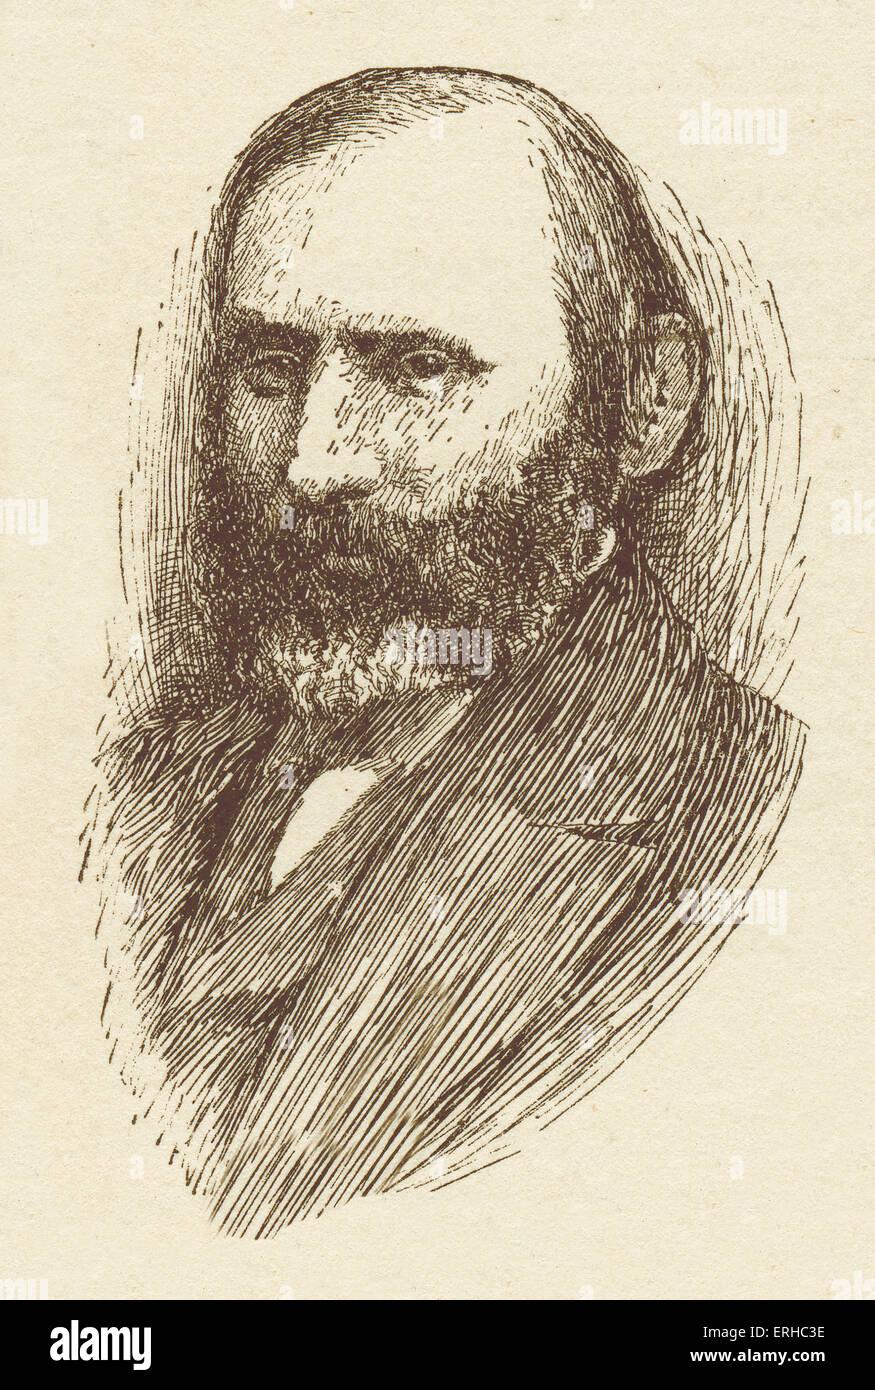 Abraham Mapu, portrait. LithuanianJewish novelist in Hebrew,  of the 'Haskalah' movement (Jewish enlightenment) - Stock Image